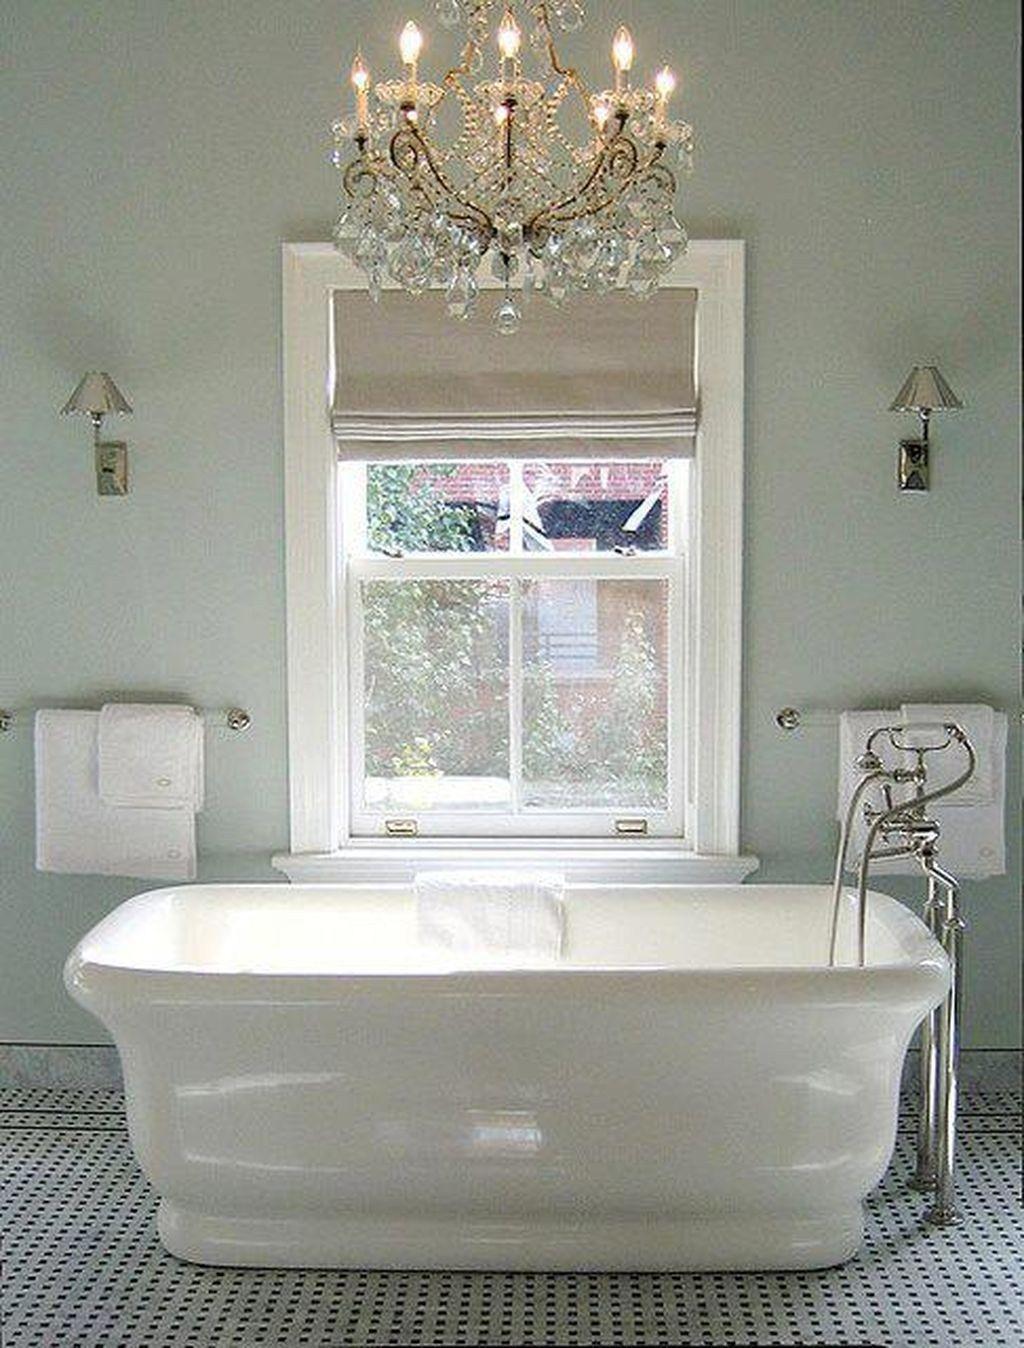 Romantic And Elegant Bathroom Design Ideas With Chandeliers ...